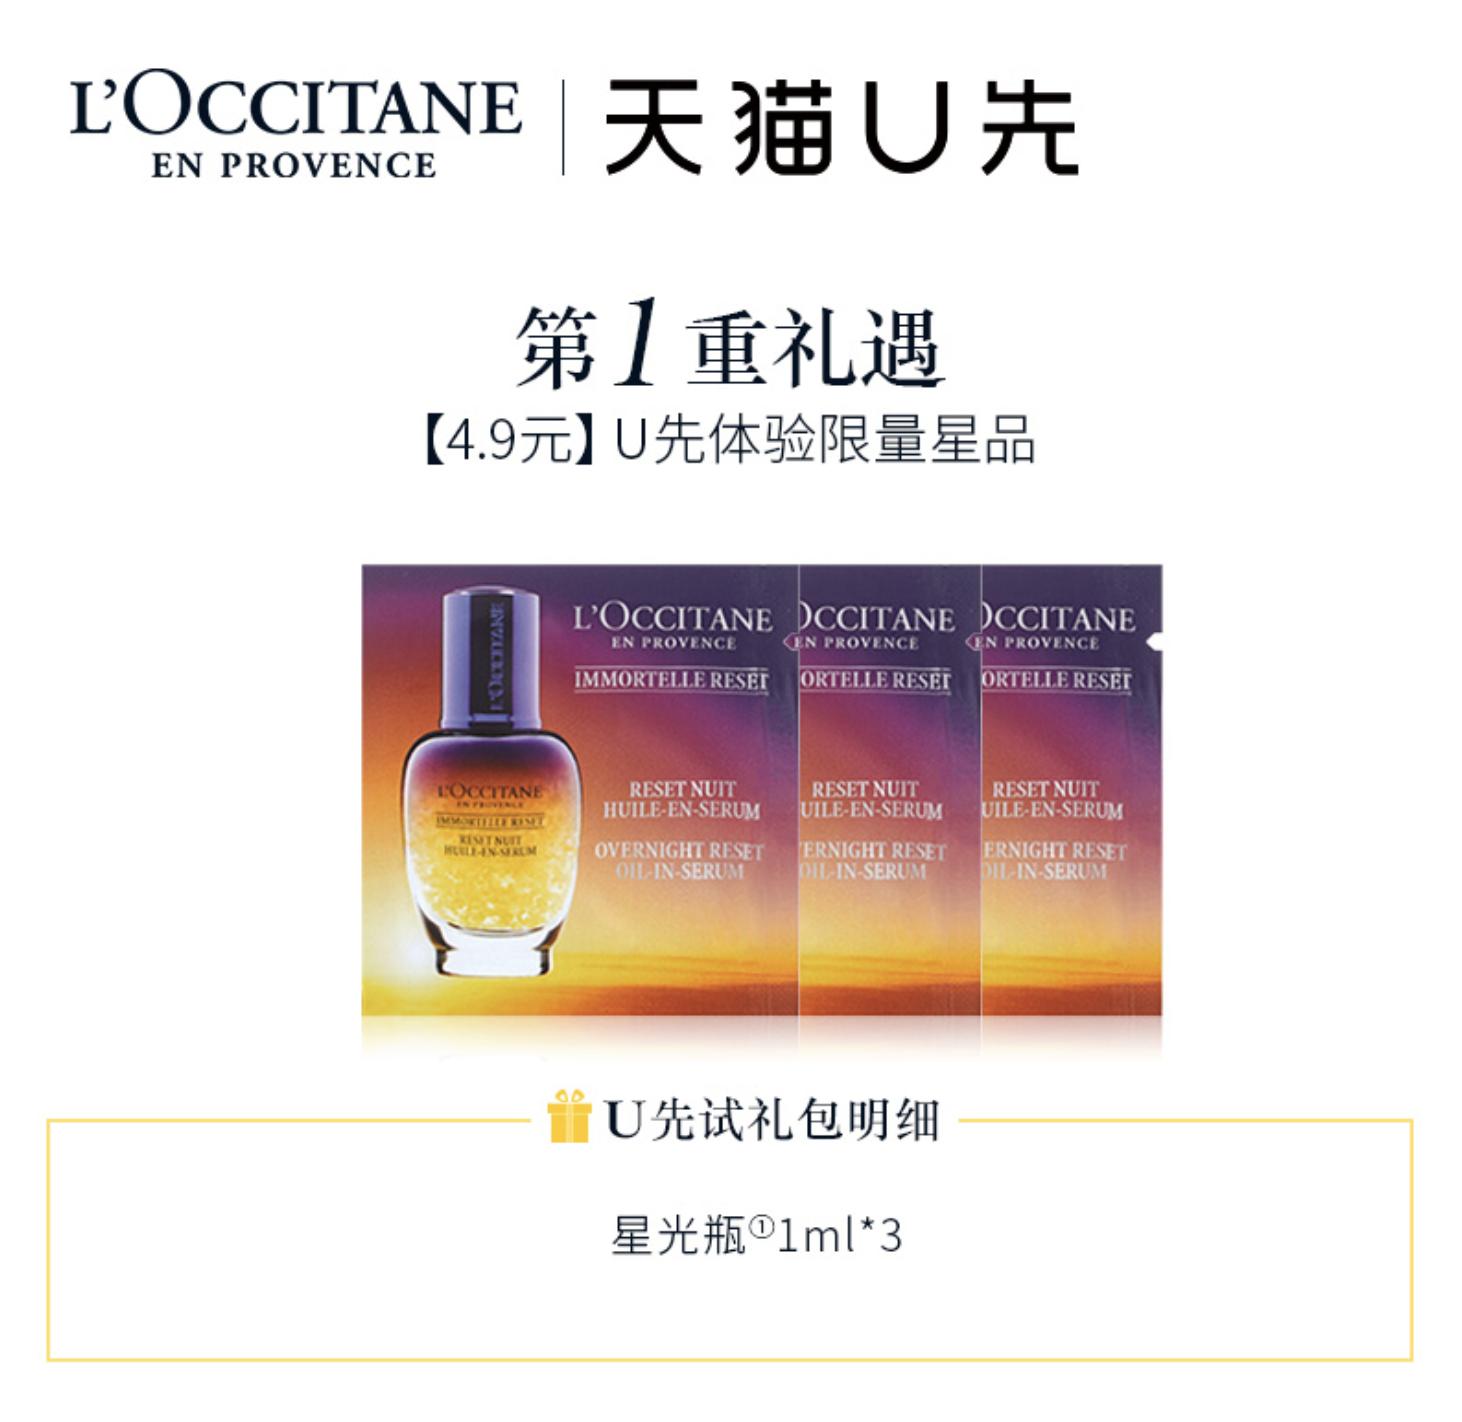 L'OCCITANE 欧舒丹 星光瓶 焕活微囊肌底精华液 1ml*3+10元优惠券